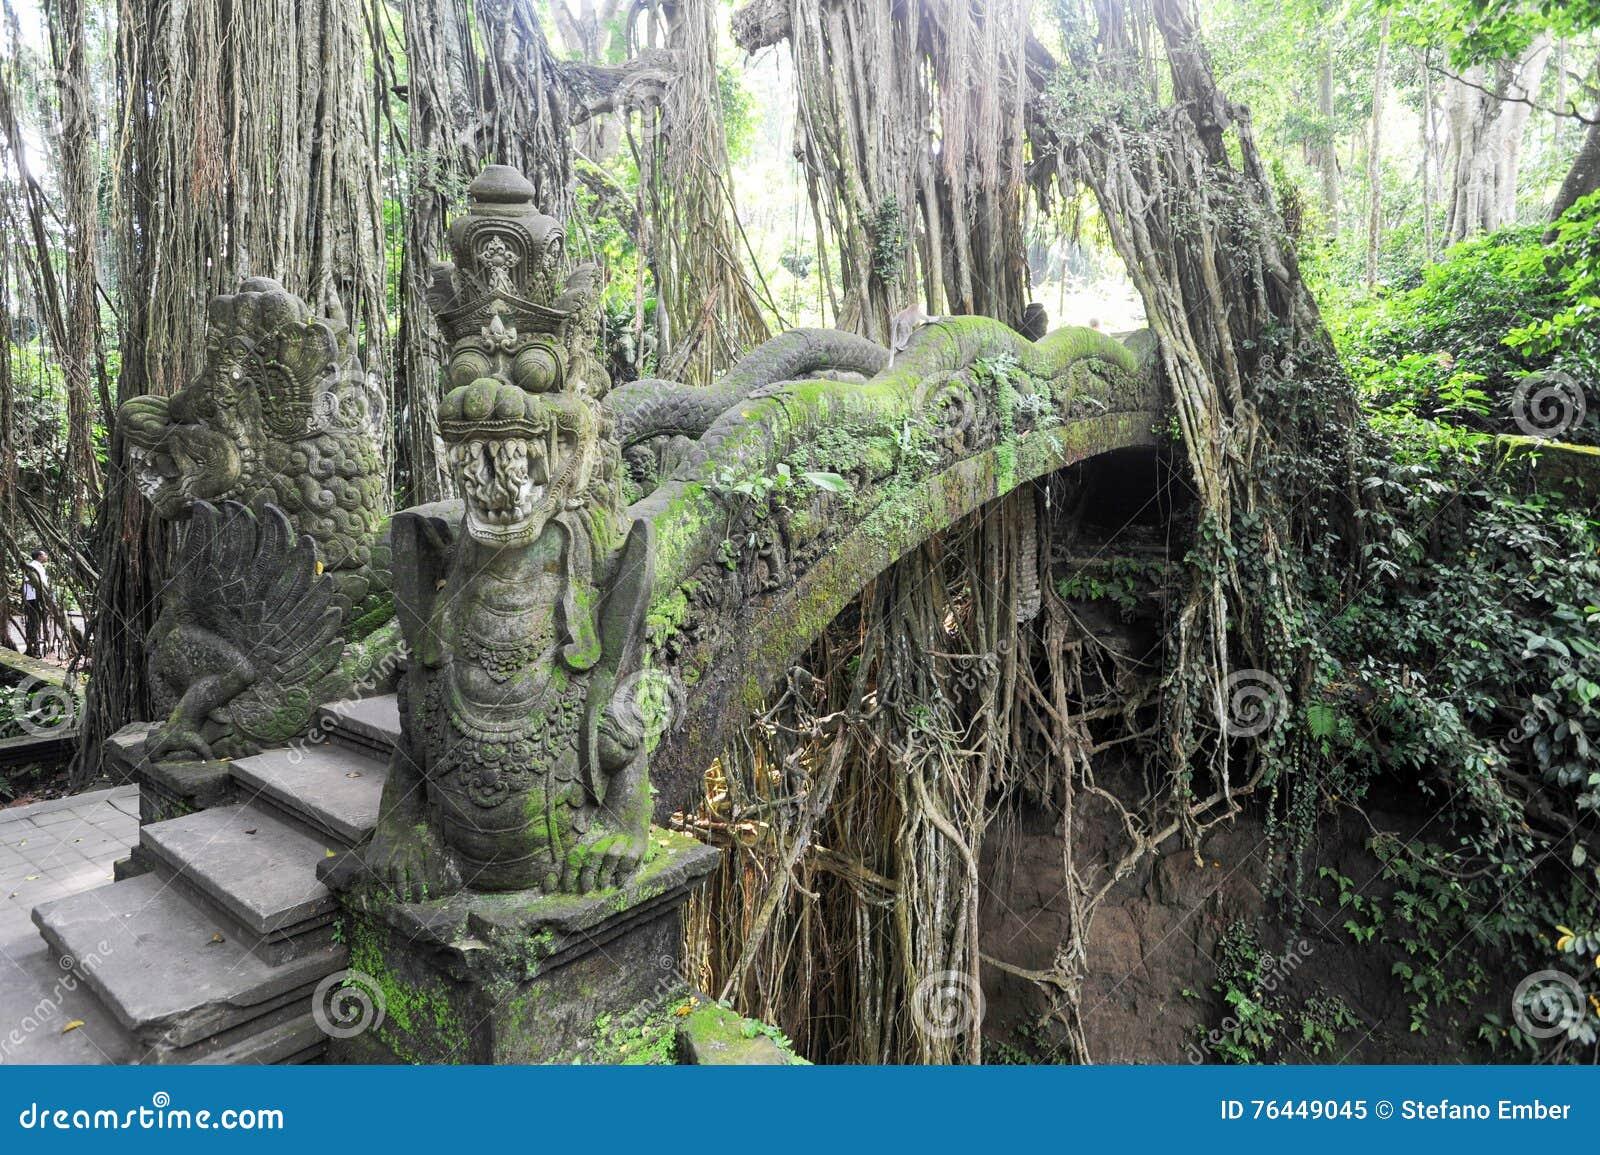 Dragon Bridge no macaco sagrado Forest Sanctuary, Ubud, Bali